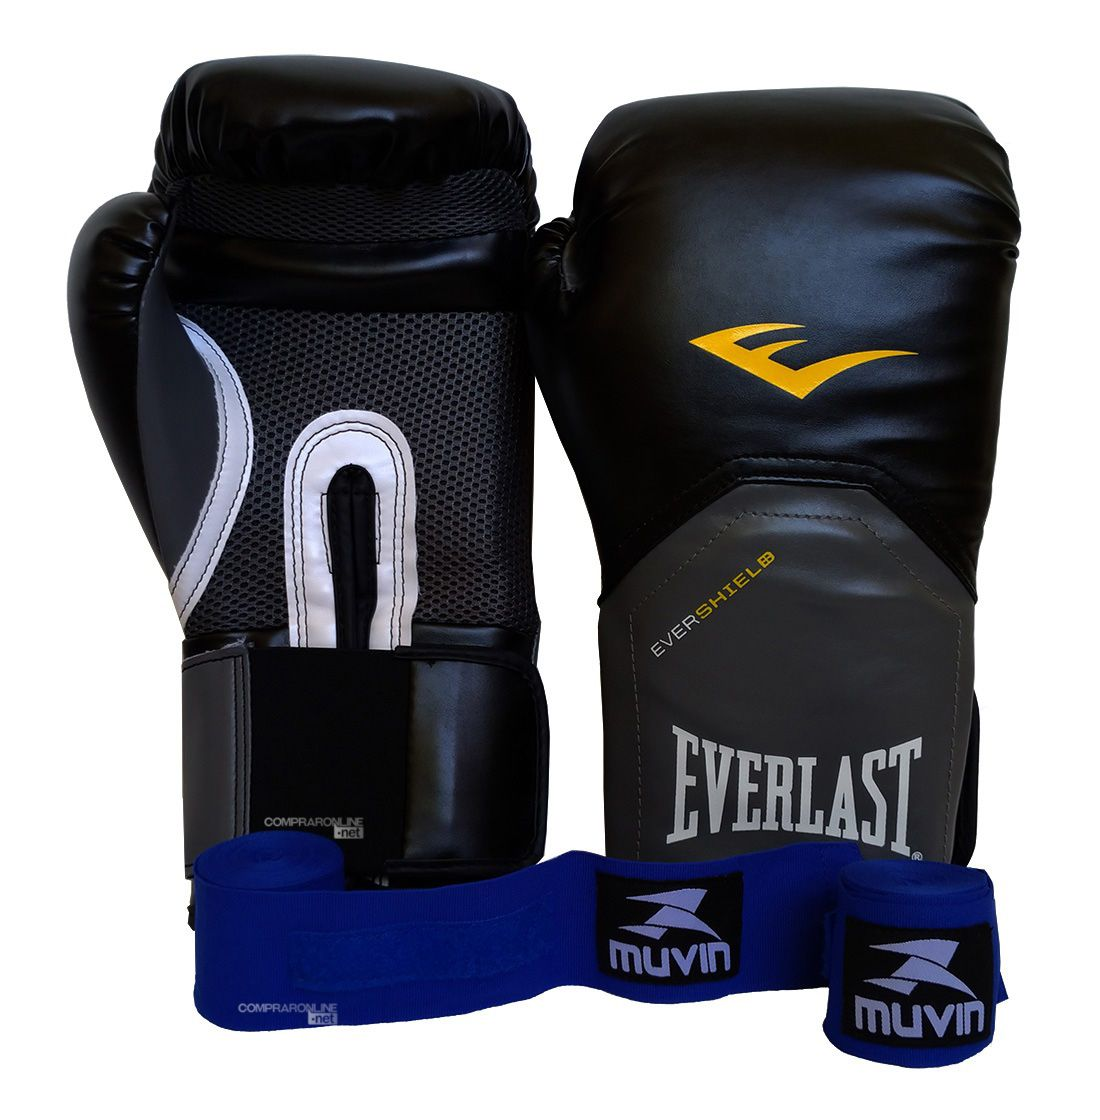 61defa81e Kit Boxe Muay Thai Luva Com Bandagens 12 Oz Everlast Pro Style - Comprar  Online .Net